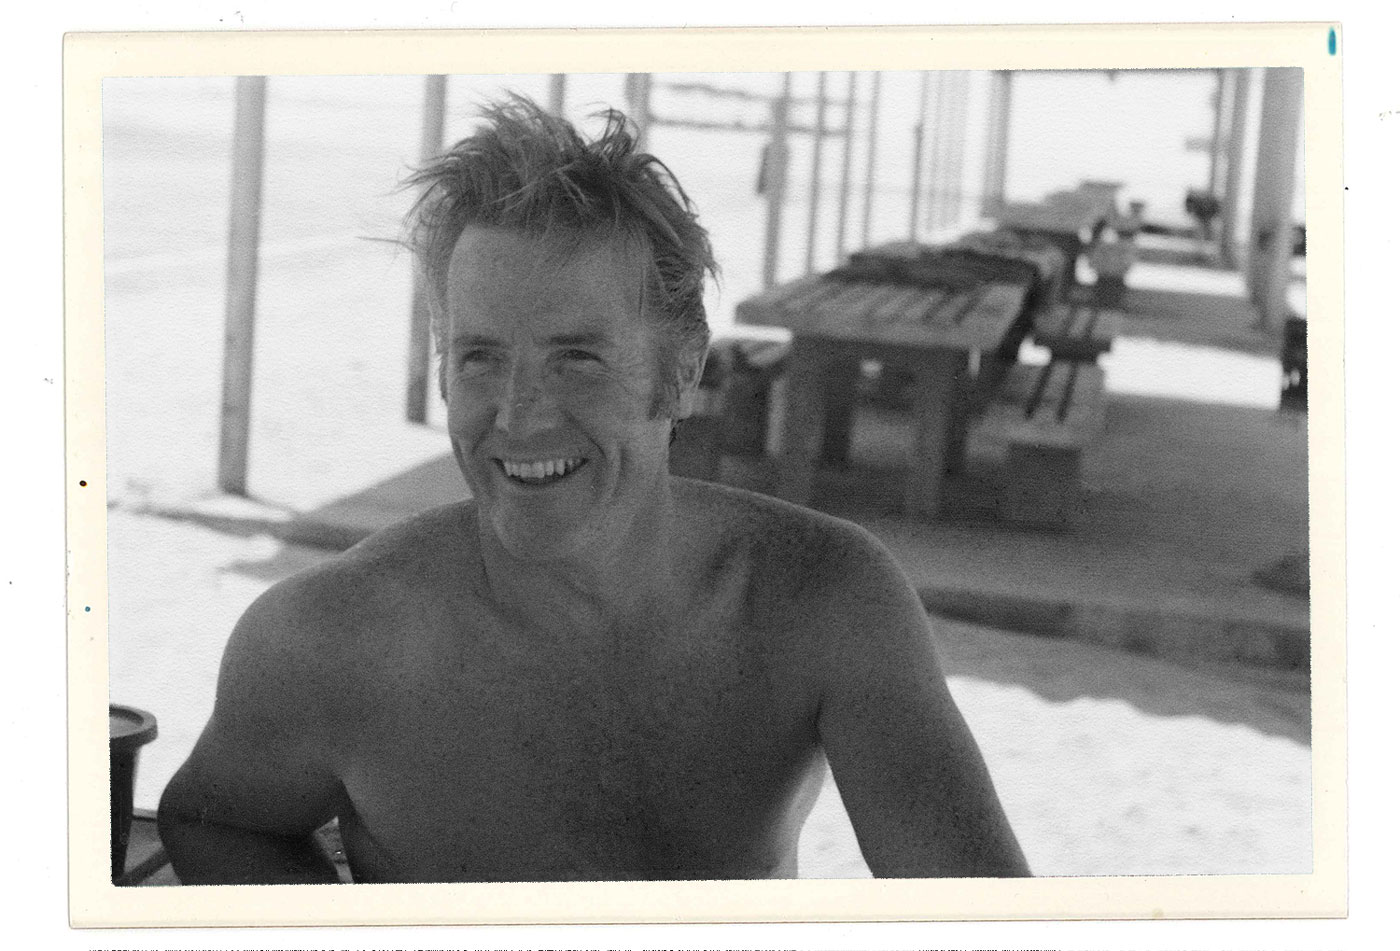 Dad on a Saudi beach circa 1978, the Persian Gulf behind him and a days sailing ahead.